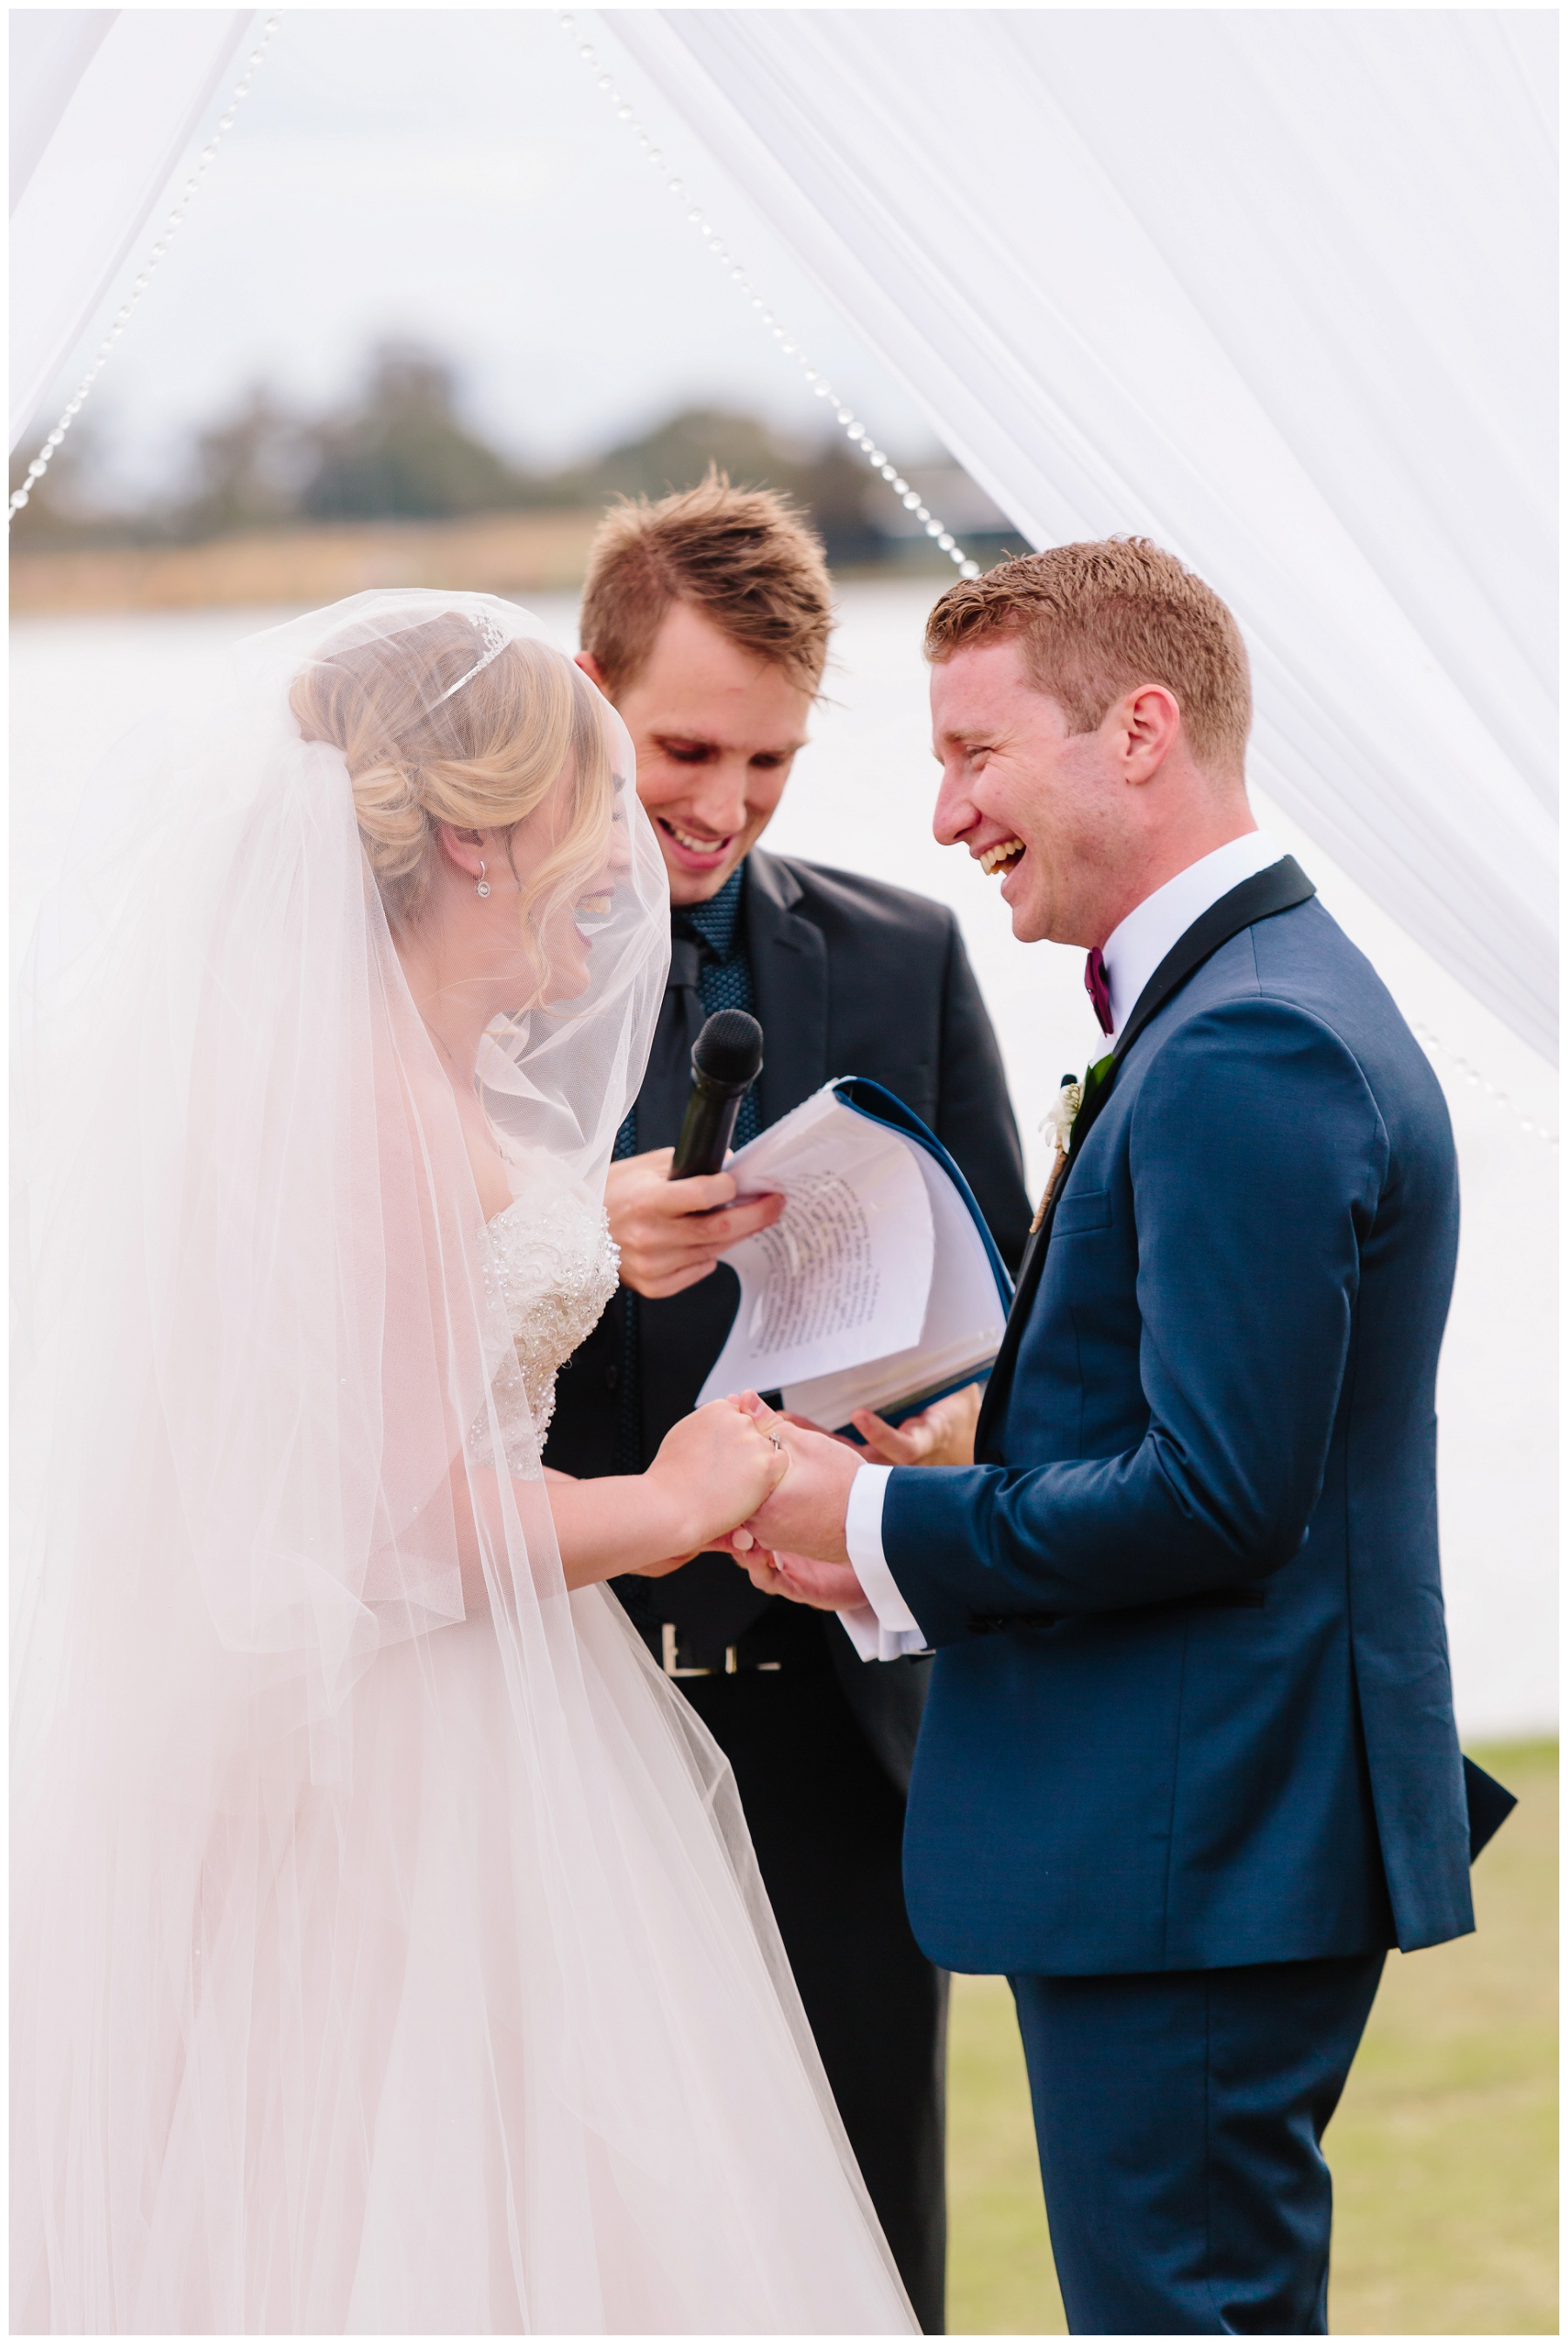 Perth river wedding ceremony